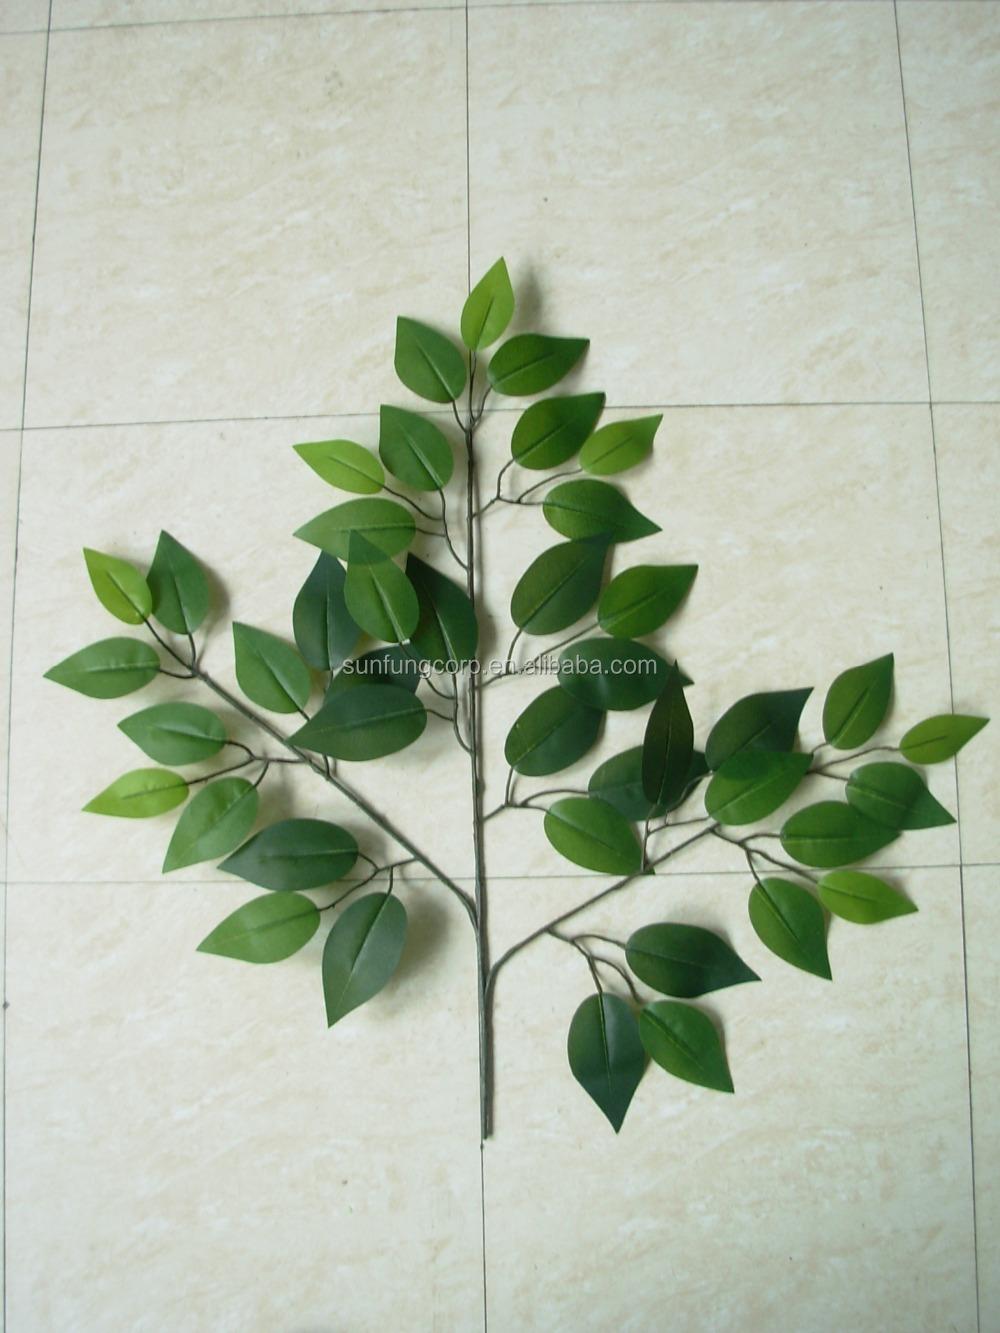 Sun Fung Quality Bamboo Spray Decorative Ficus Artificial